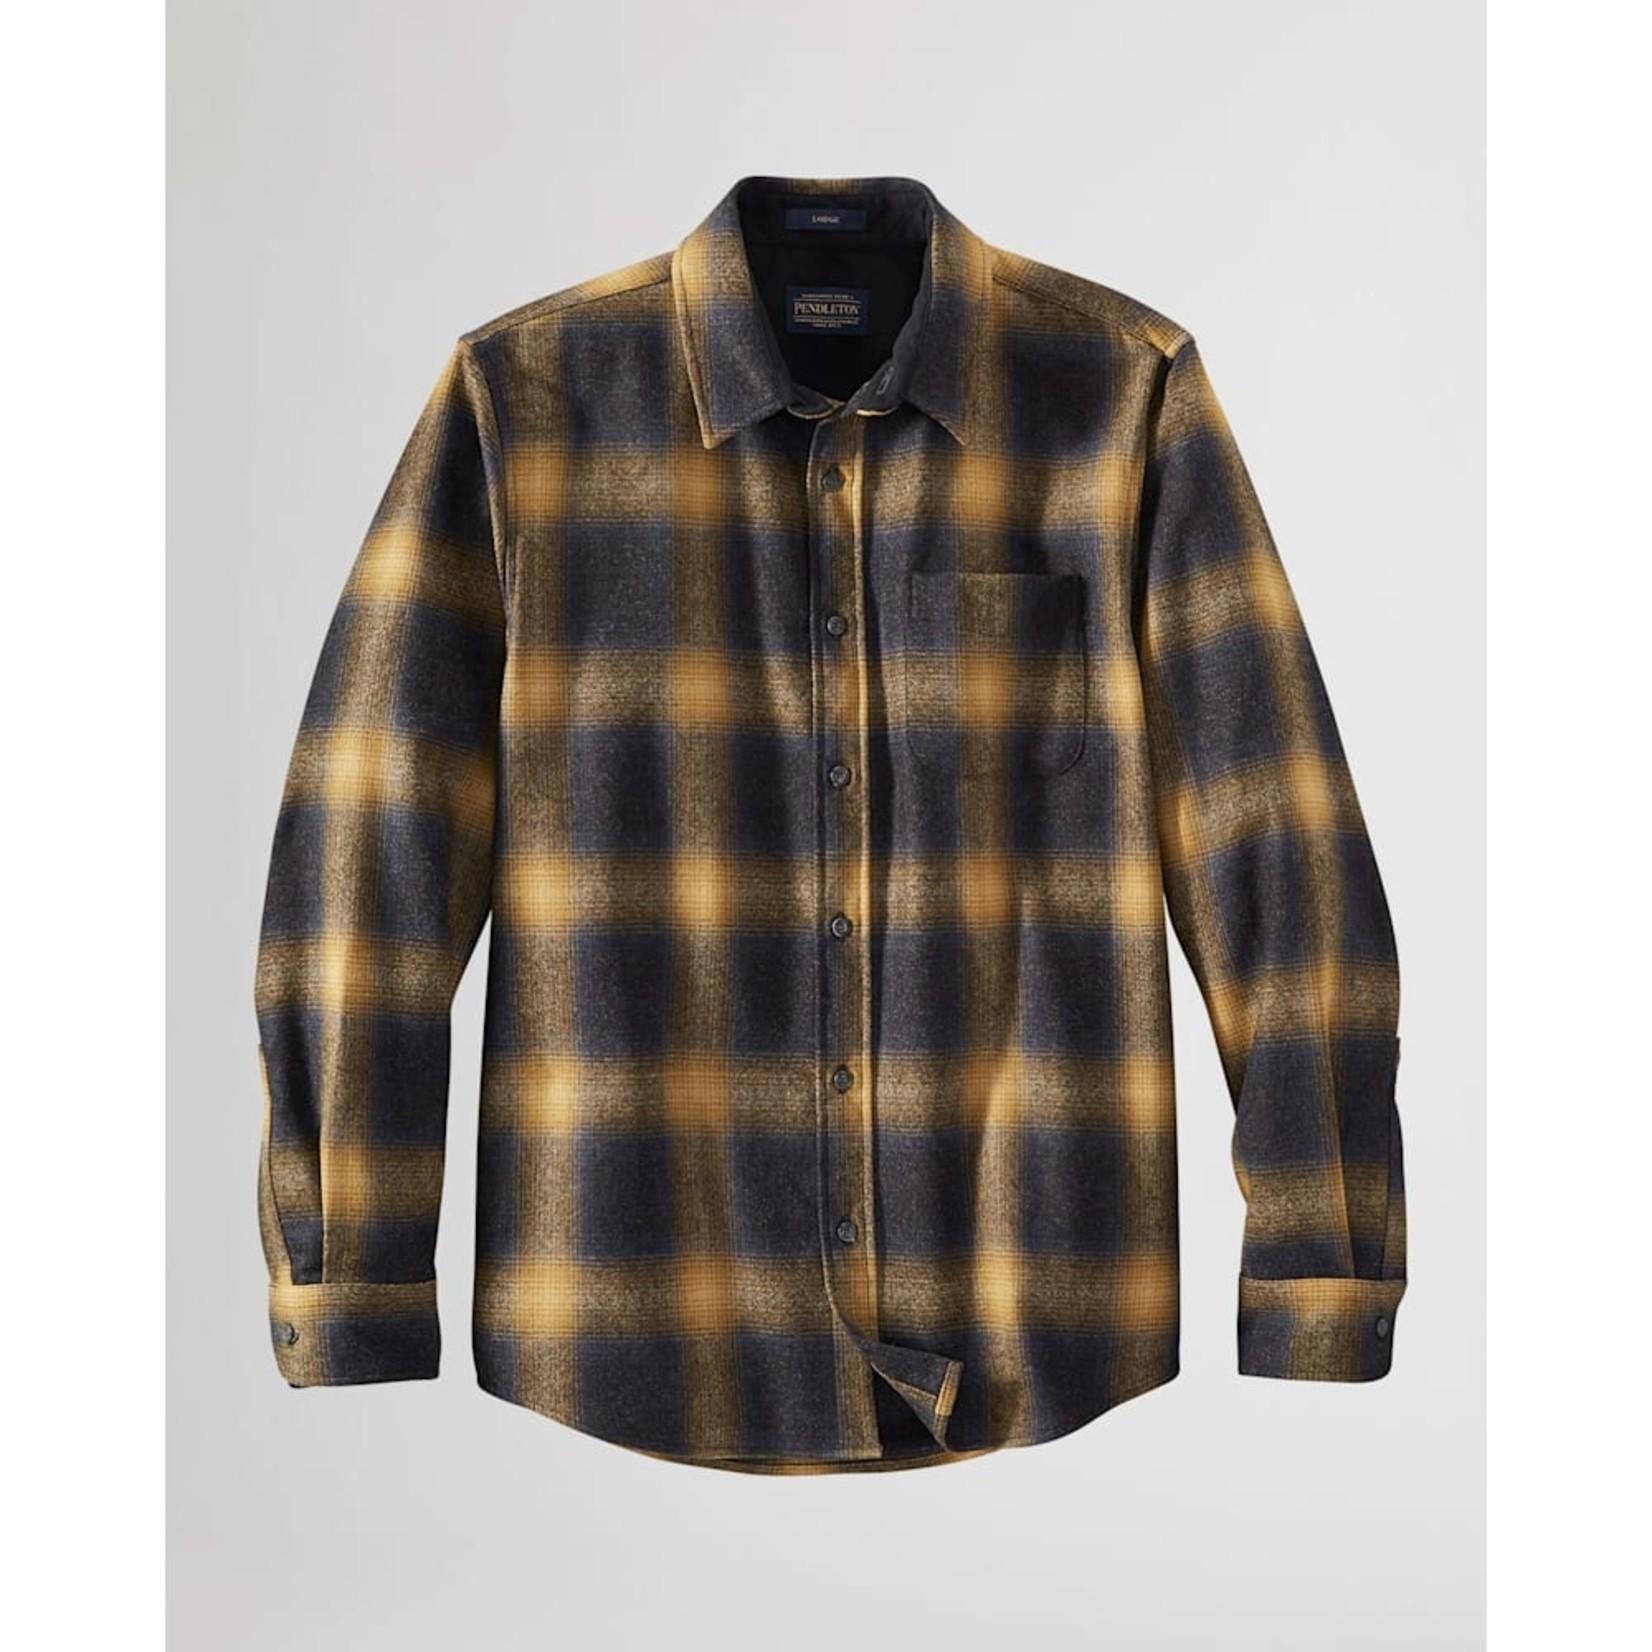 Pendleton Pendleton Fitted Lodge Shirt RA644-32410